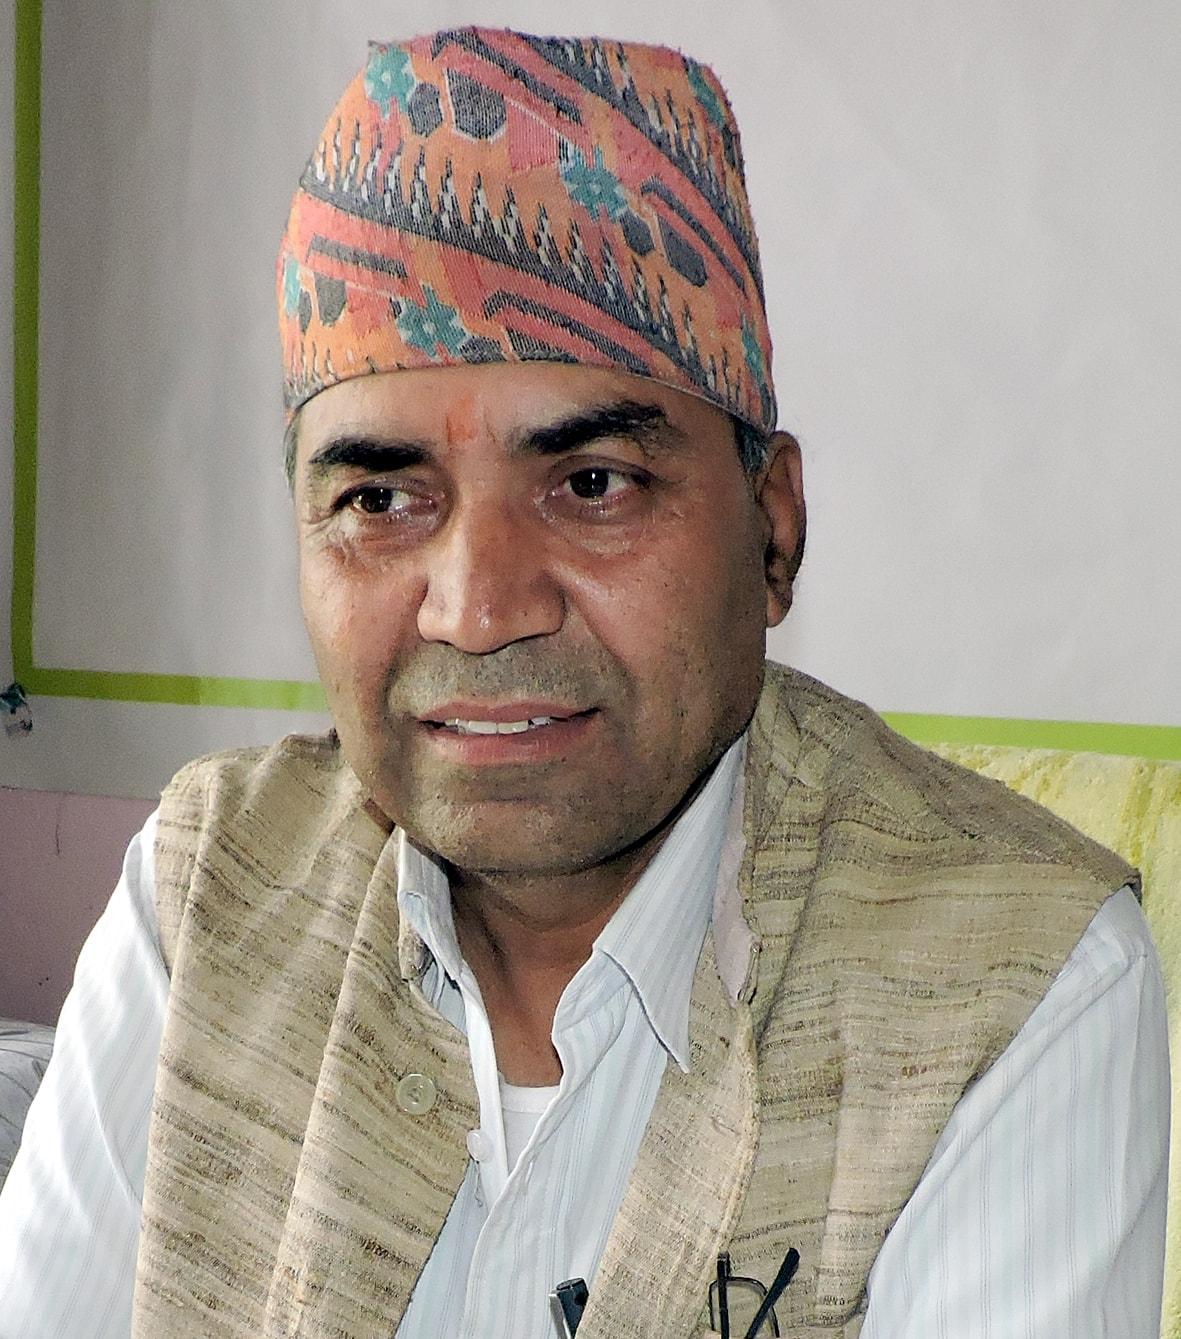 Naraya P. Upadhy